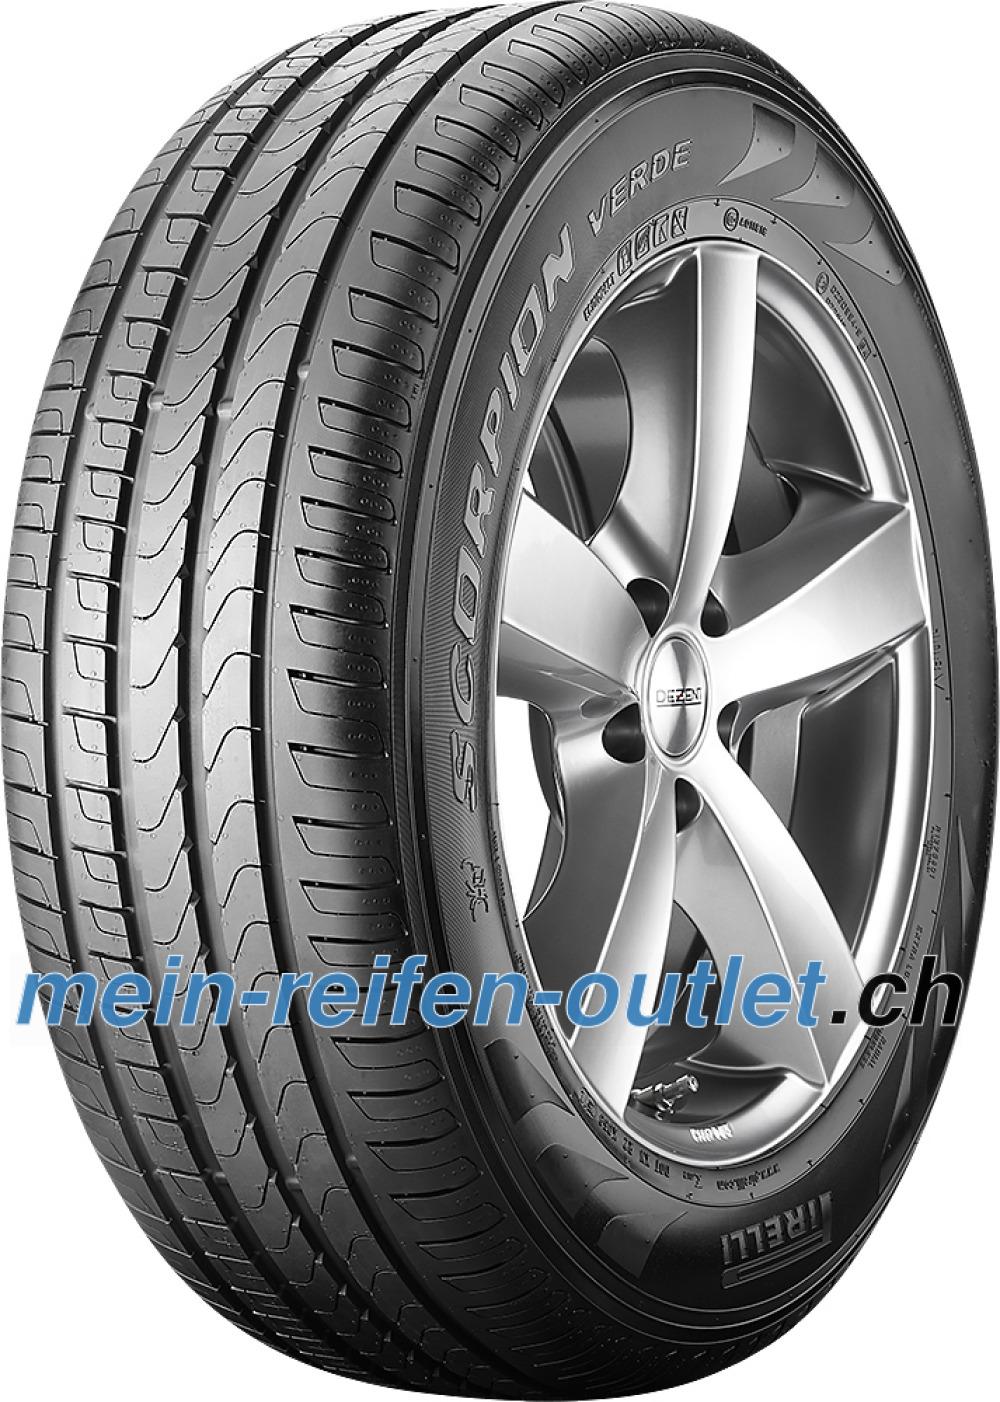 Pirelli Scorpion Verde ( 275/35 R22 104W XL VOL )